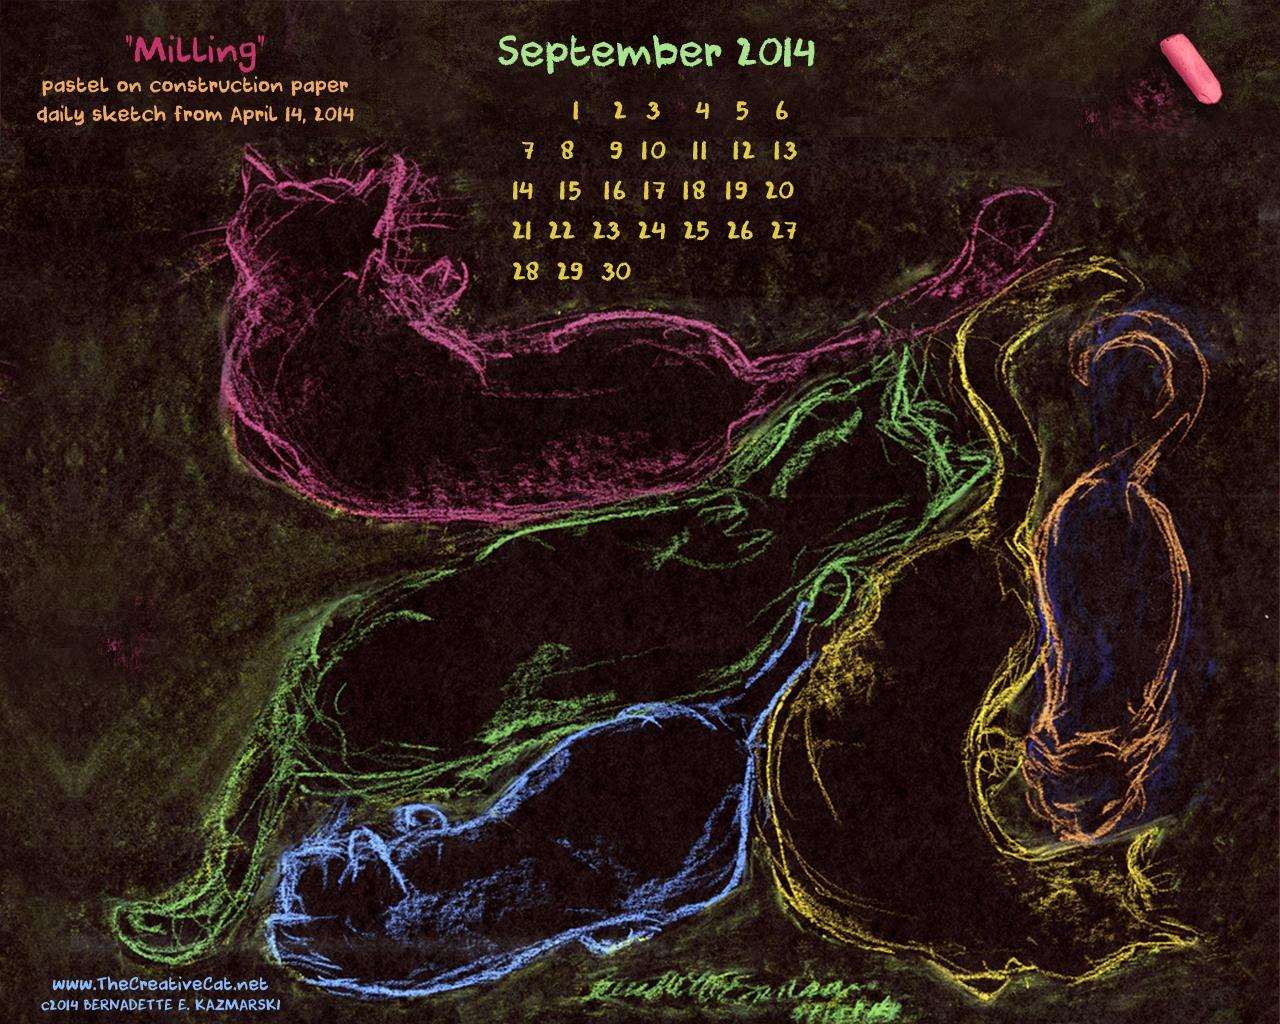 """Milling"" desktop calendar, 1280 x 1024 for square and laptop monitors"